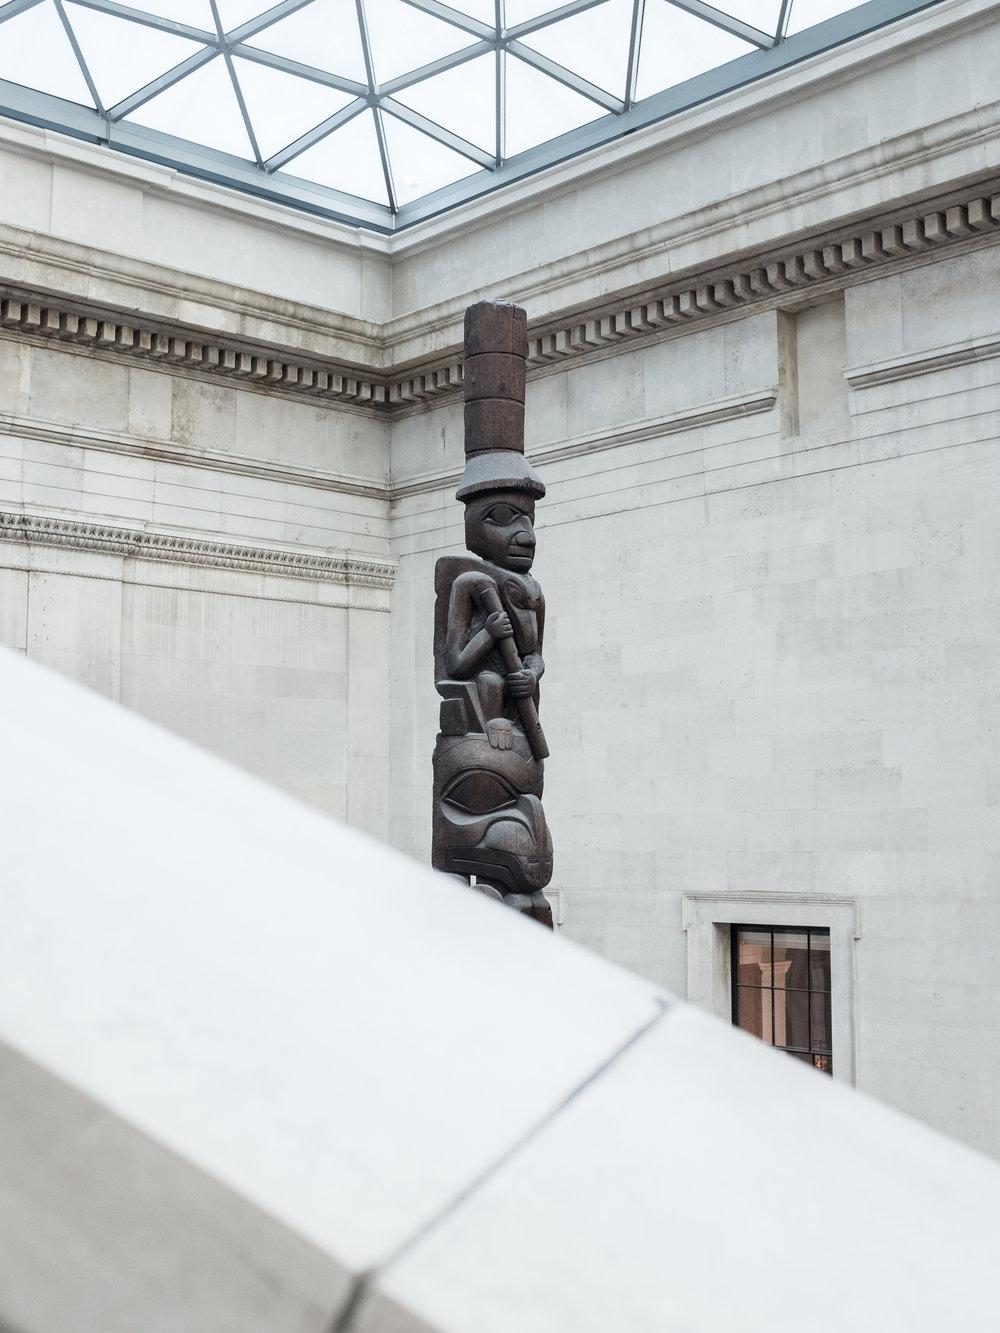 British Museum by Handover-13.jpg